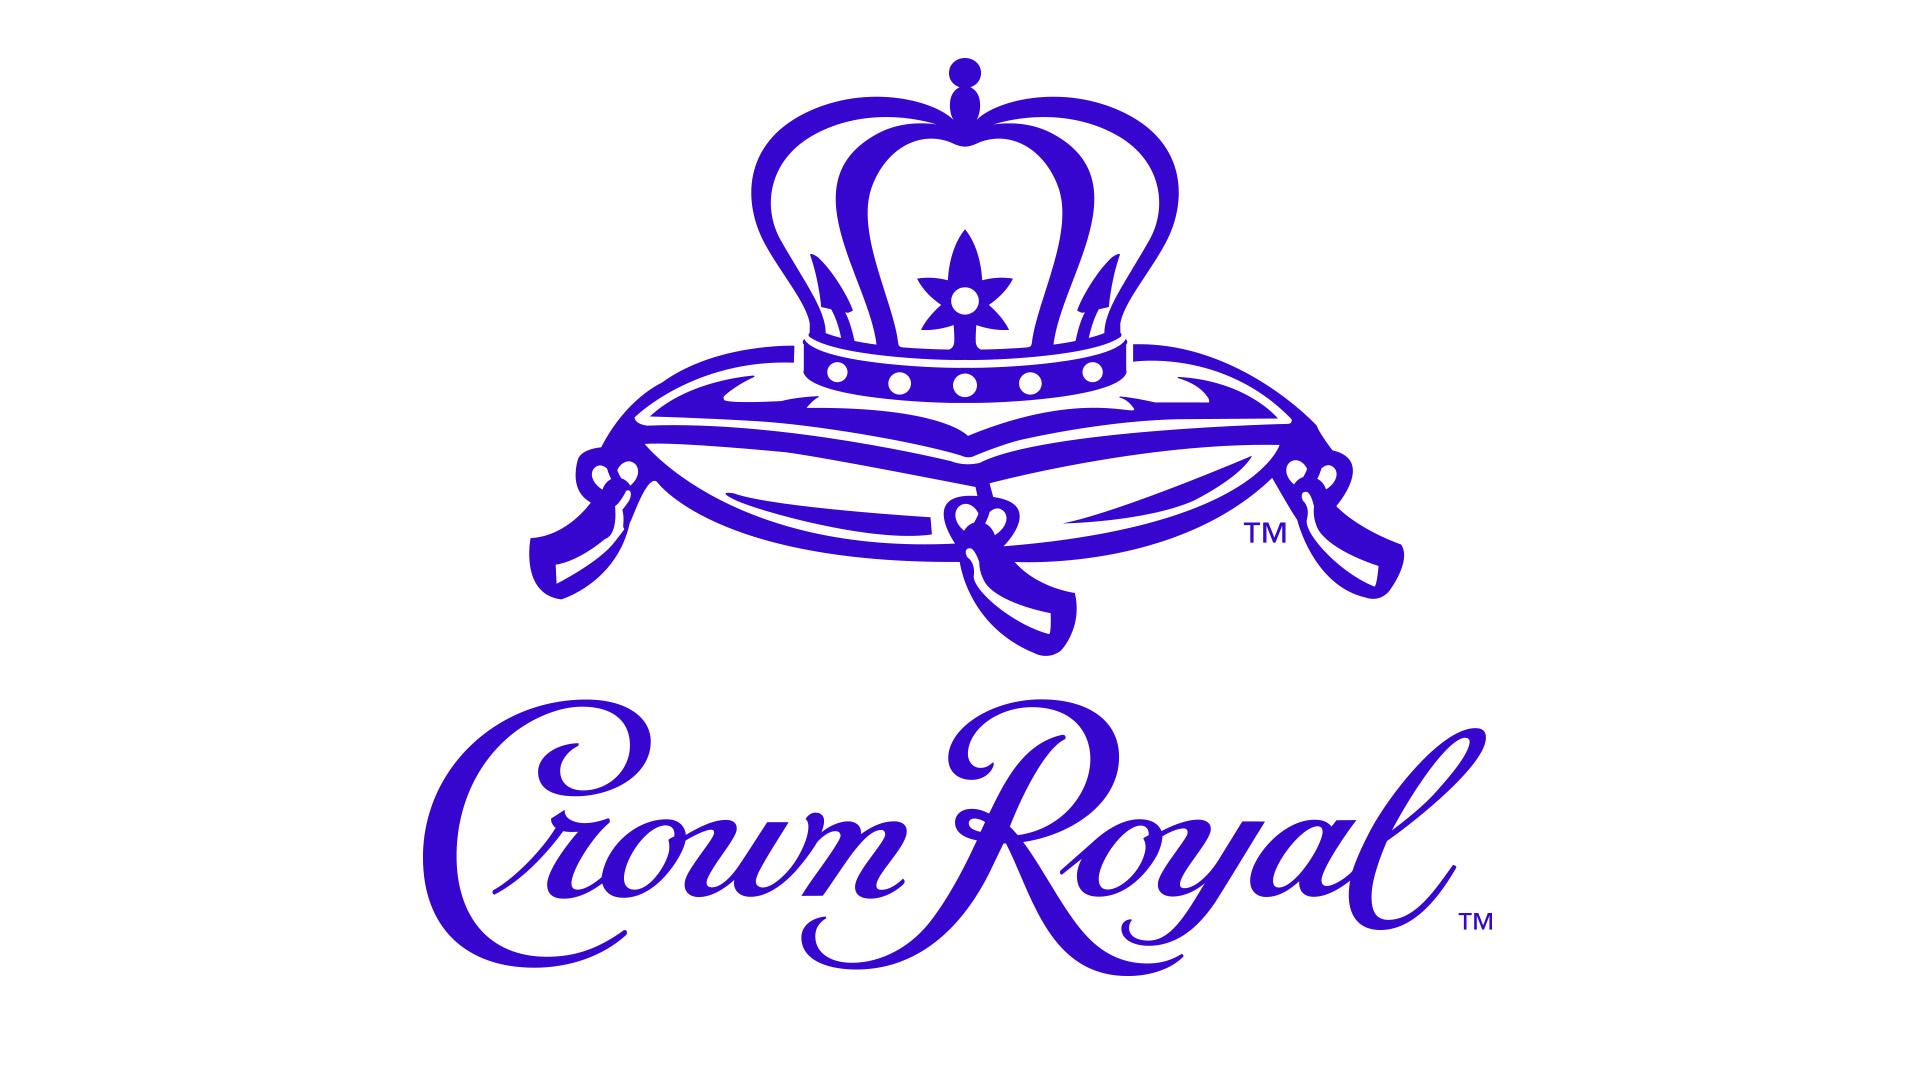 CrownRoyal_1920x1080 (1).jpg